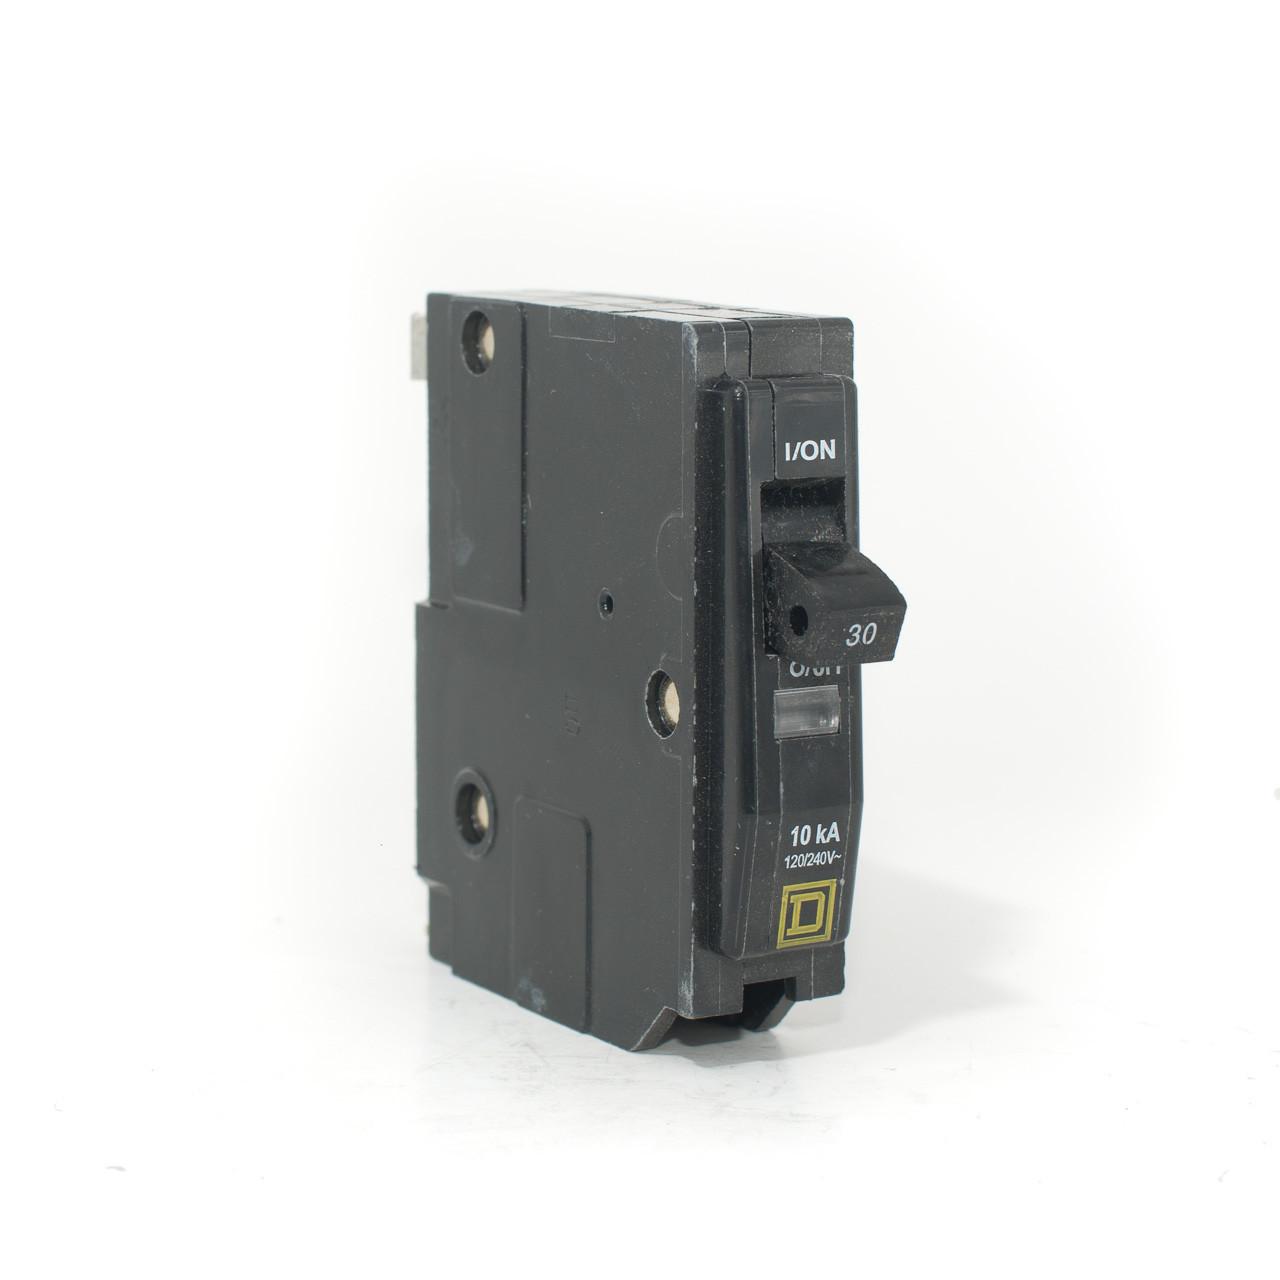 Square D Circuit Breaker 30A 120V Type QO130  NEW